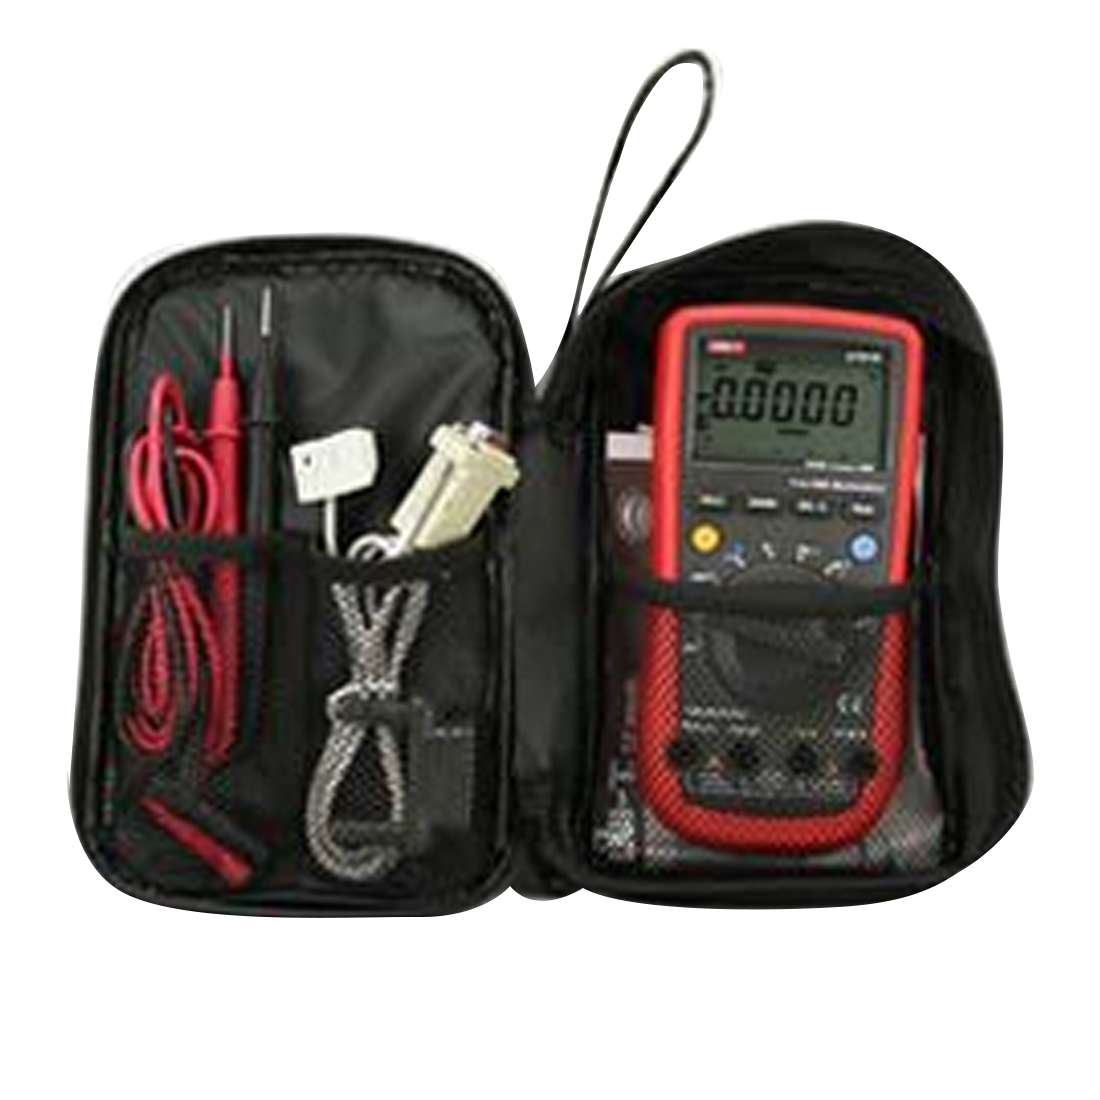 Durable  Multimeter Waterproof Tools Bag Black Canvas Bag For UT61 Series Digital Multimeter Cloth  20*12*4cm